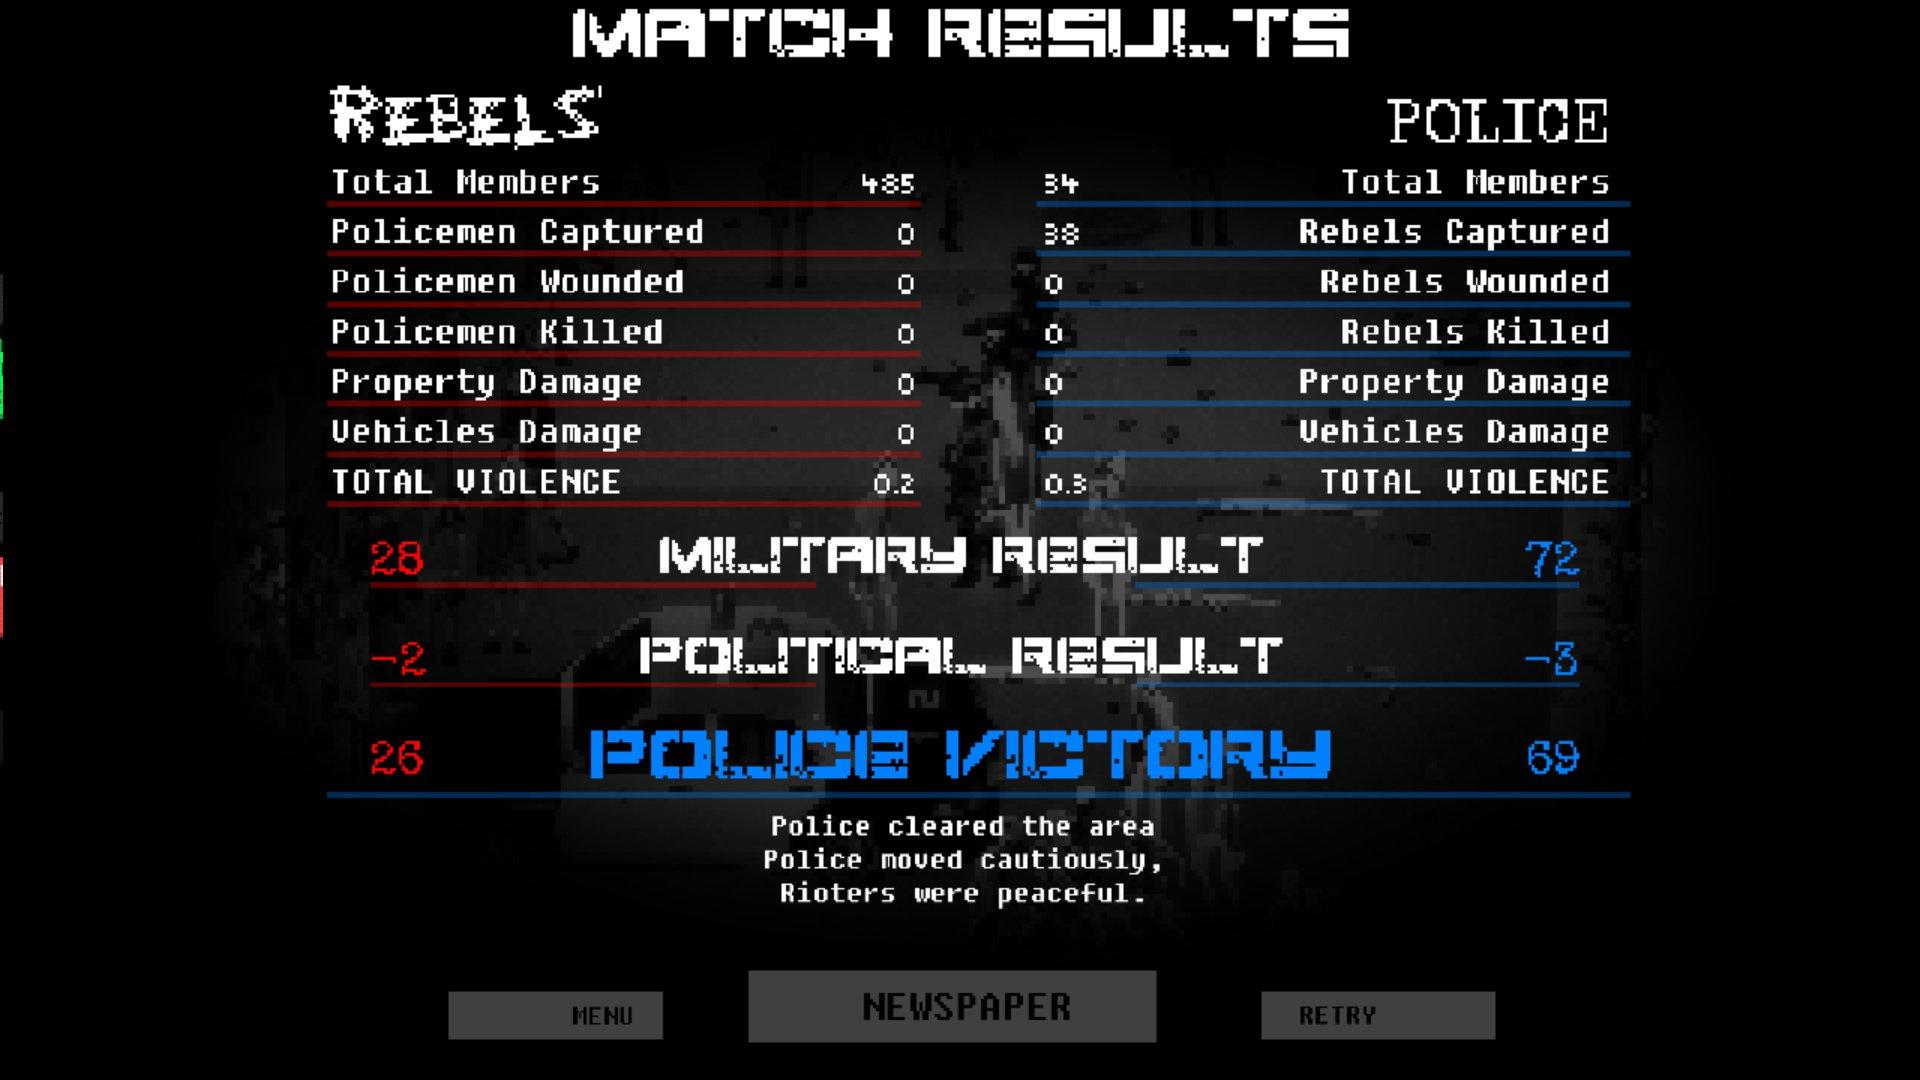 riot civil unrest results screen